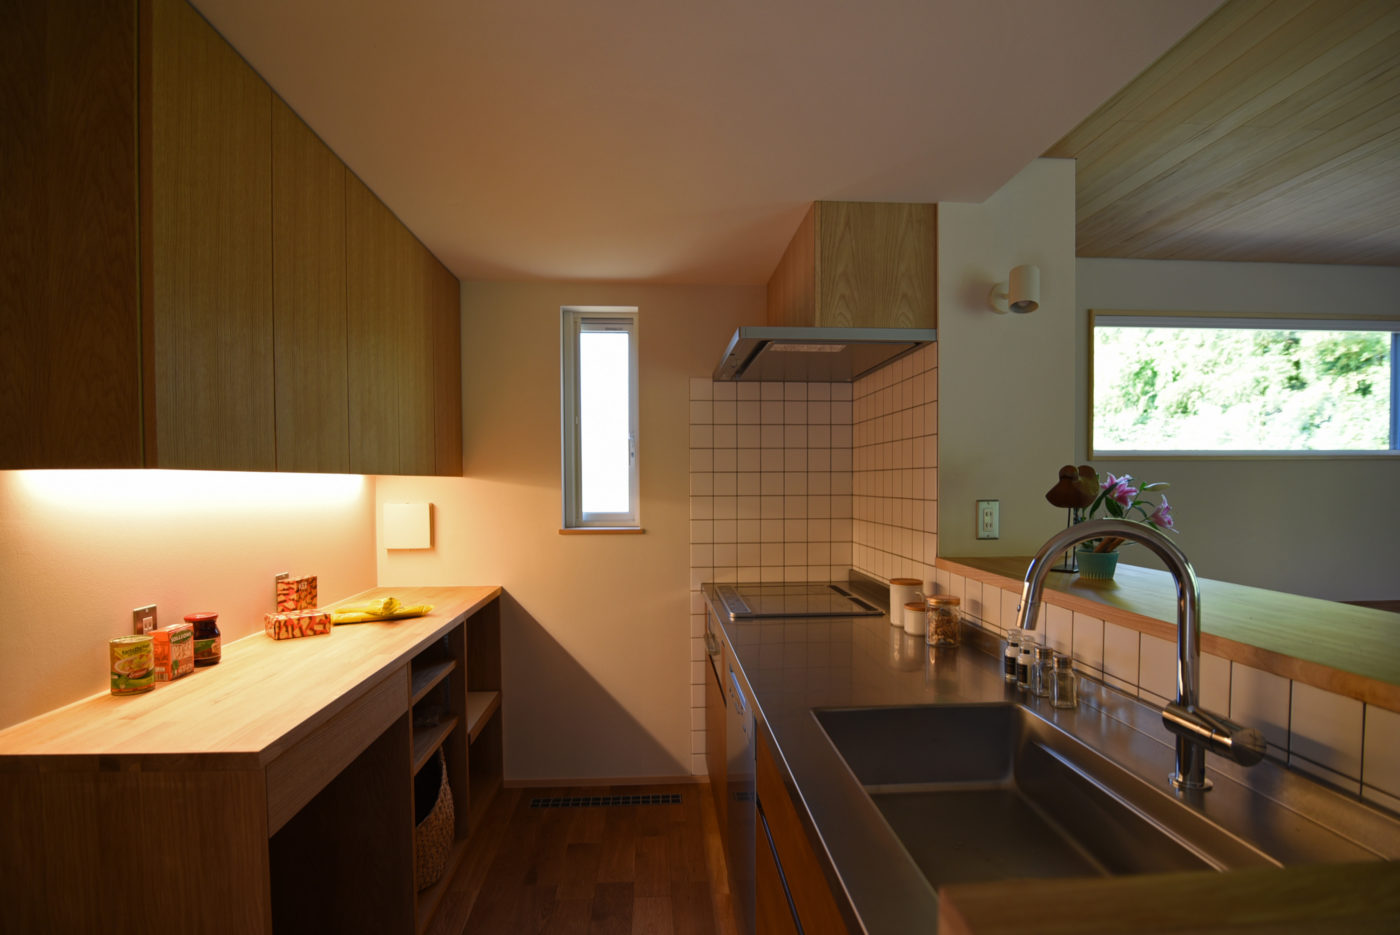 絶景の方形屋根「金津の家」